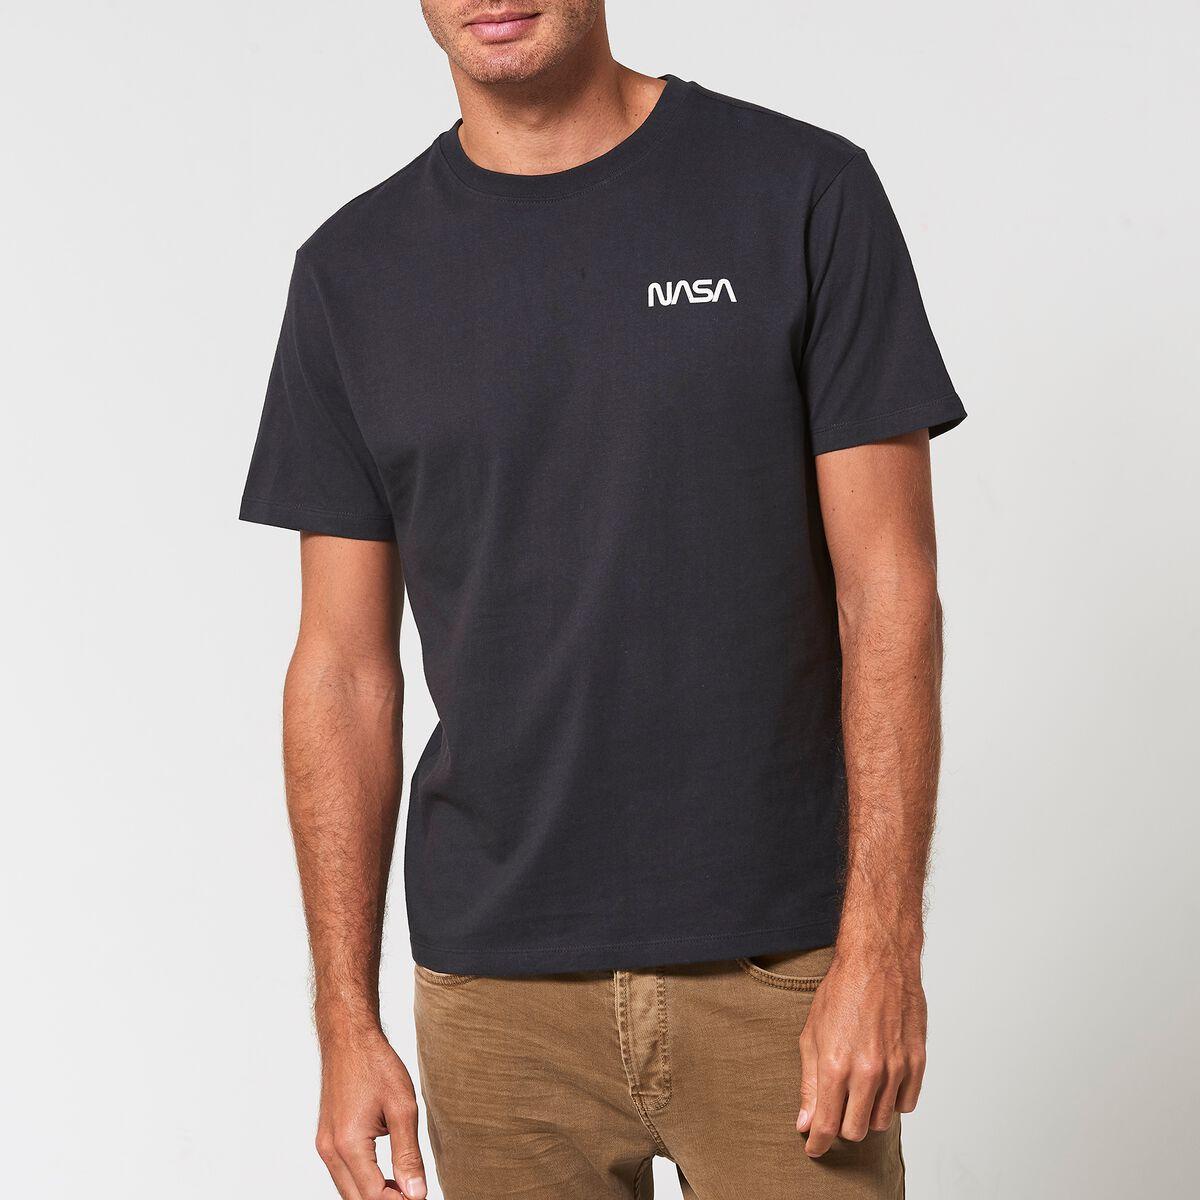 e406a36829 Men T-shirt Edgar Black Buy Online   America Today